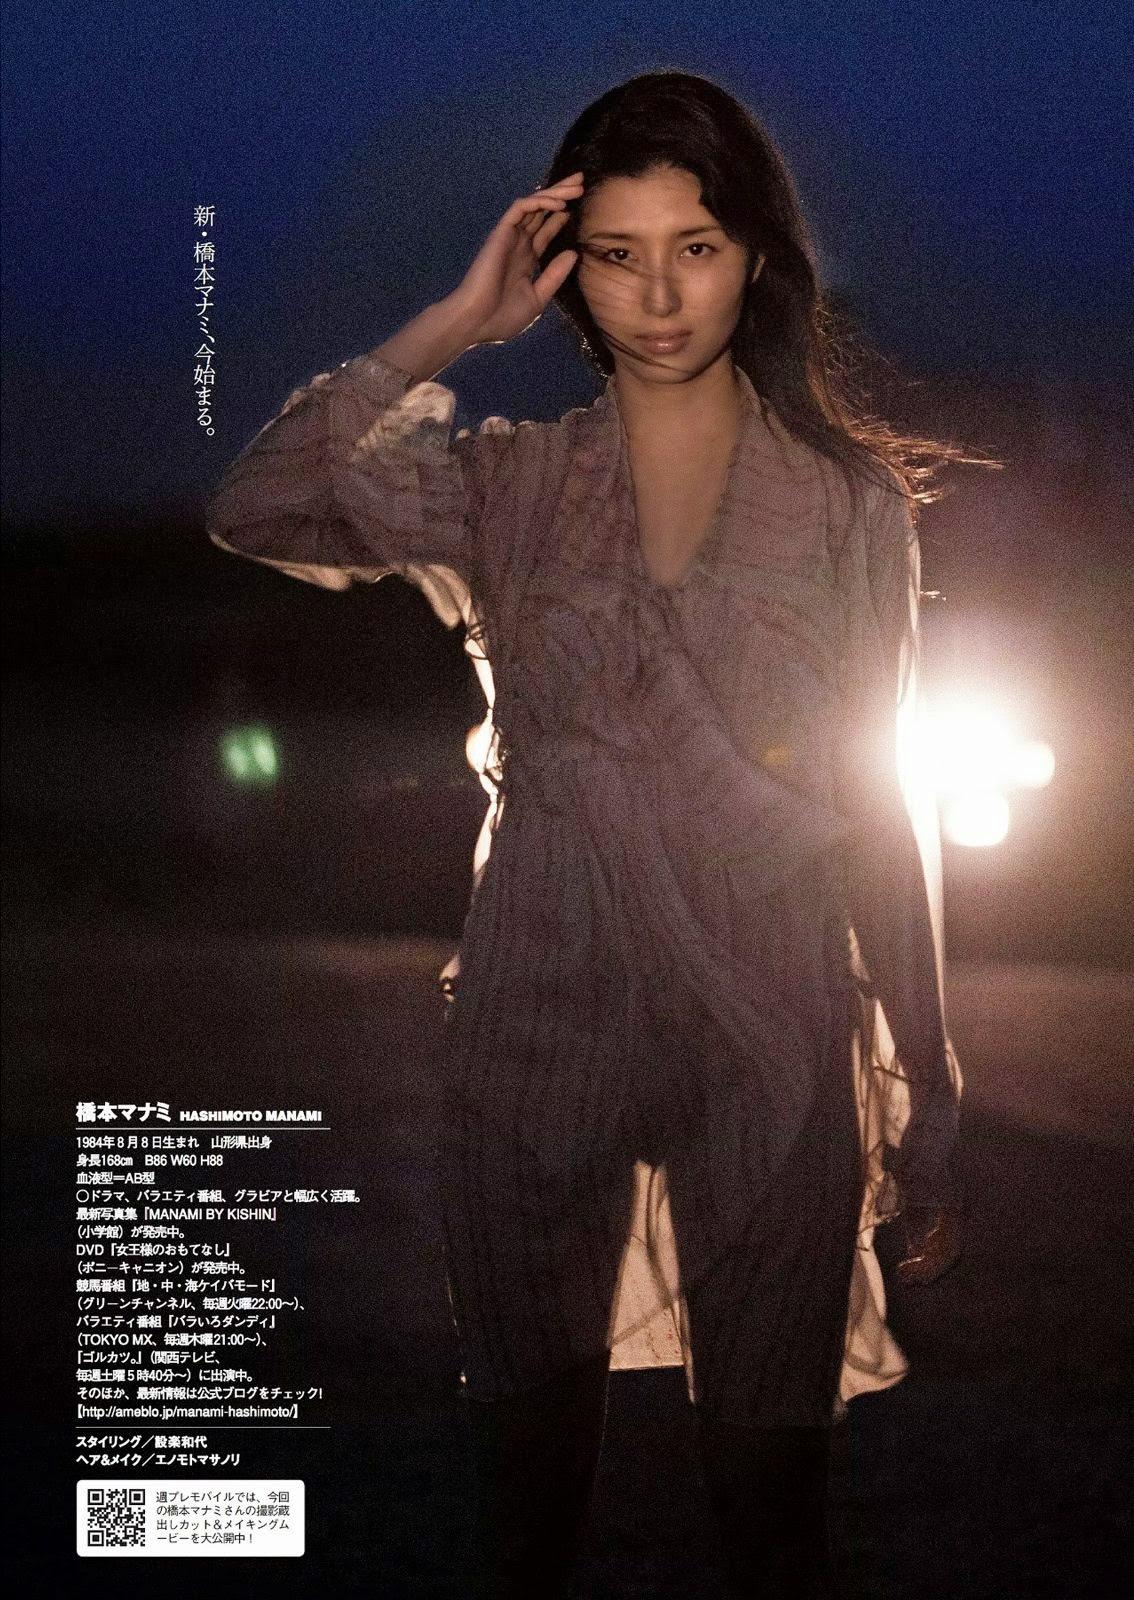 Hashimoto Manami 橋本マナミ Weekly Playboy 週刊プレイボーイ No 18 2015 Images 6